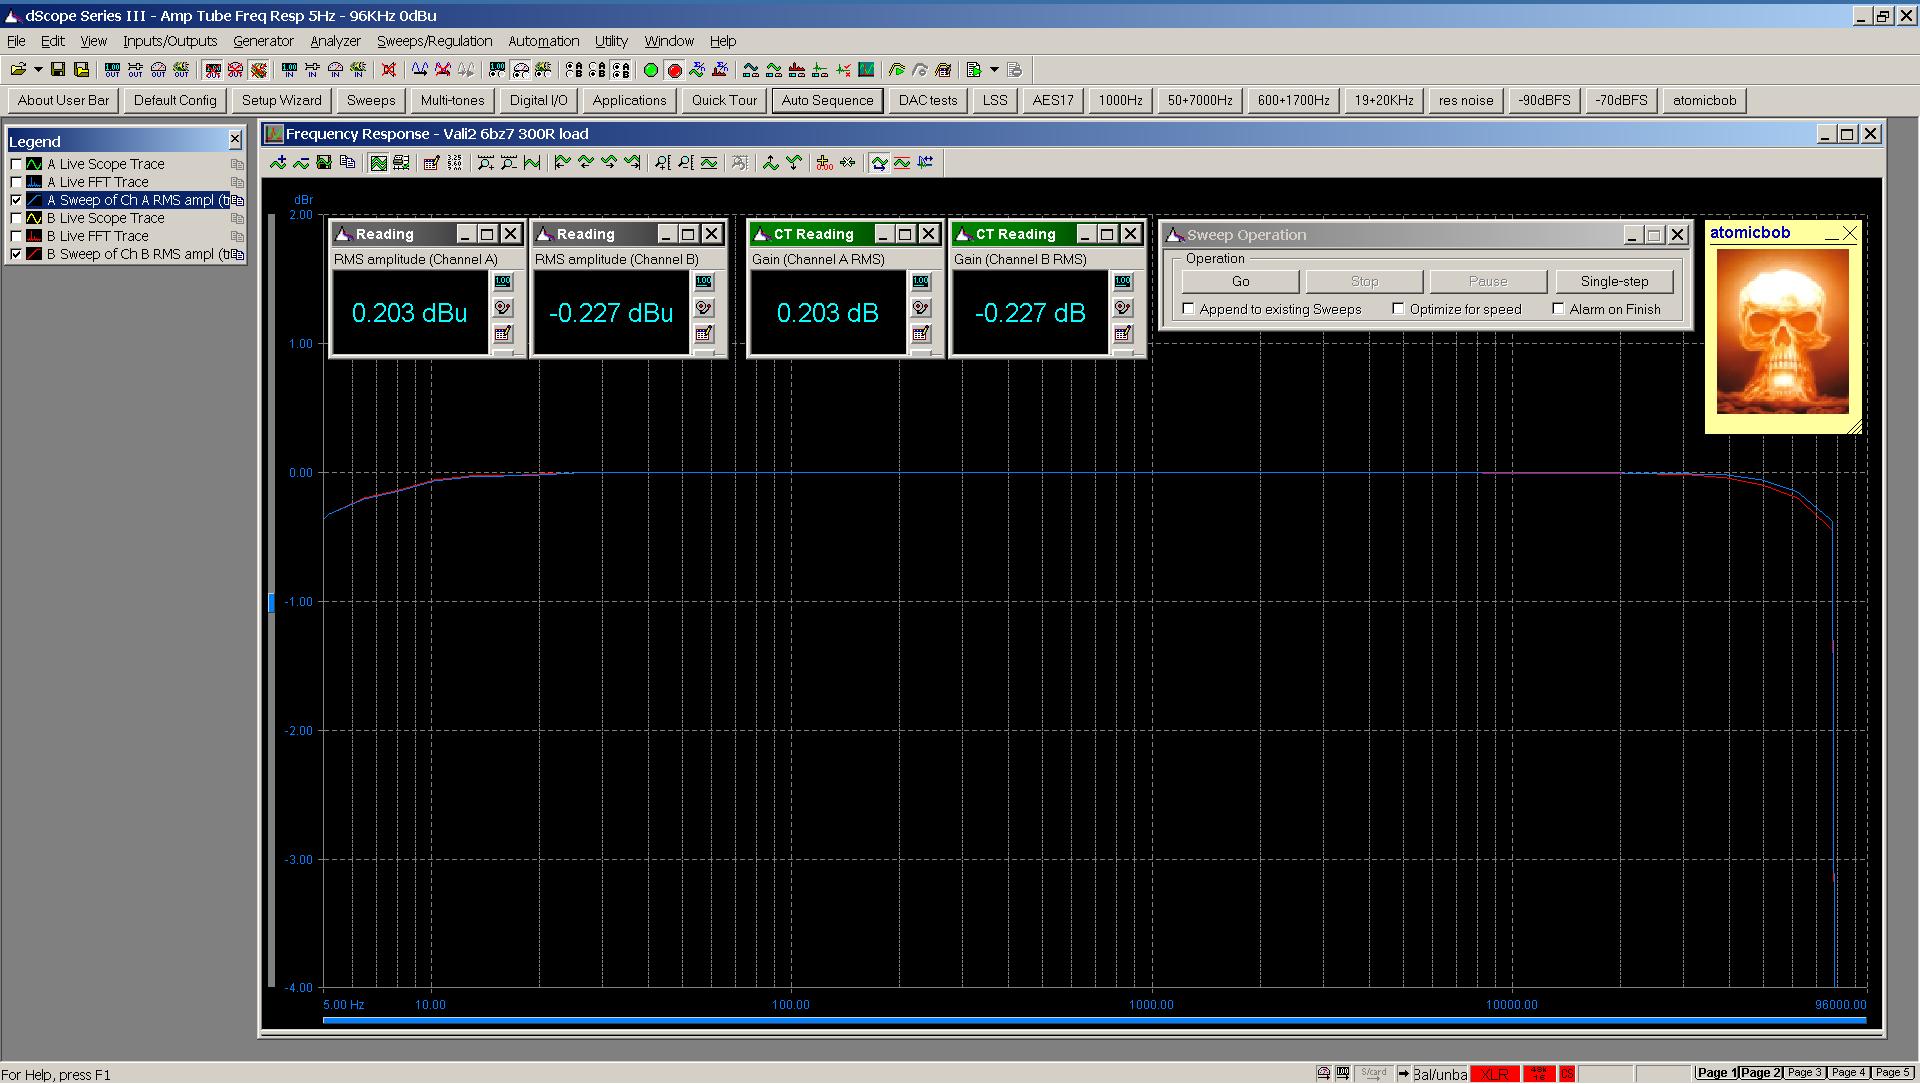 20201125 Vali2 6bz7 frequency response 5Hz - 96KHz 300R 0dBu.png